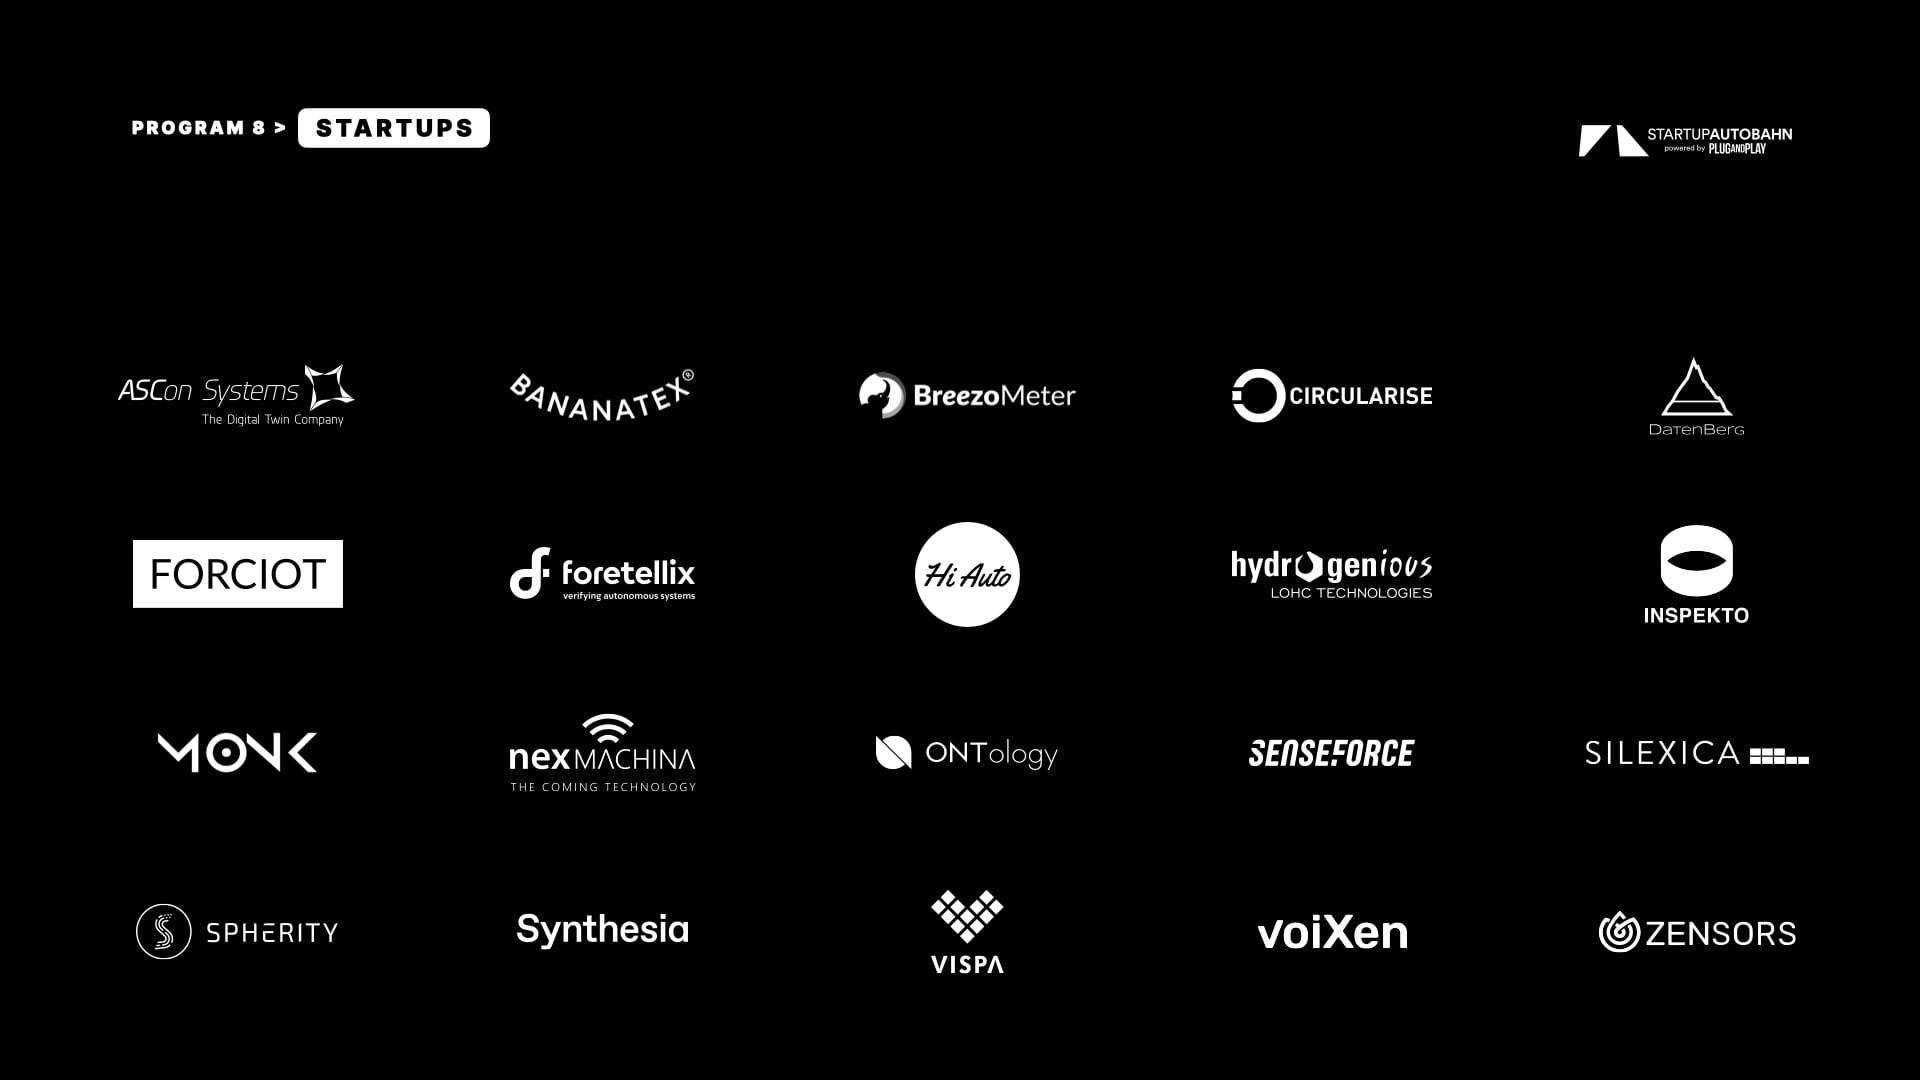 Daimler and ASCon Systems – Startup Autobahn EXPO 8